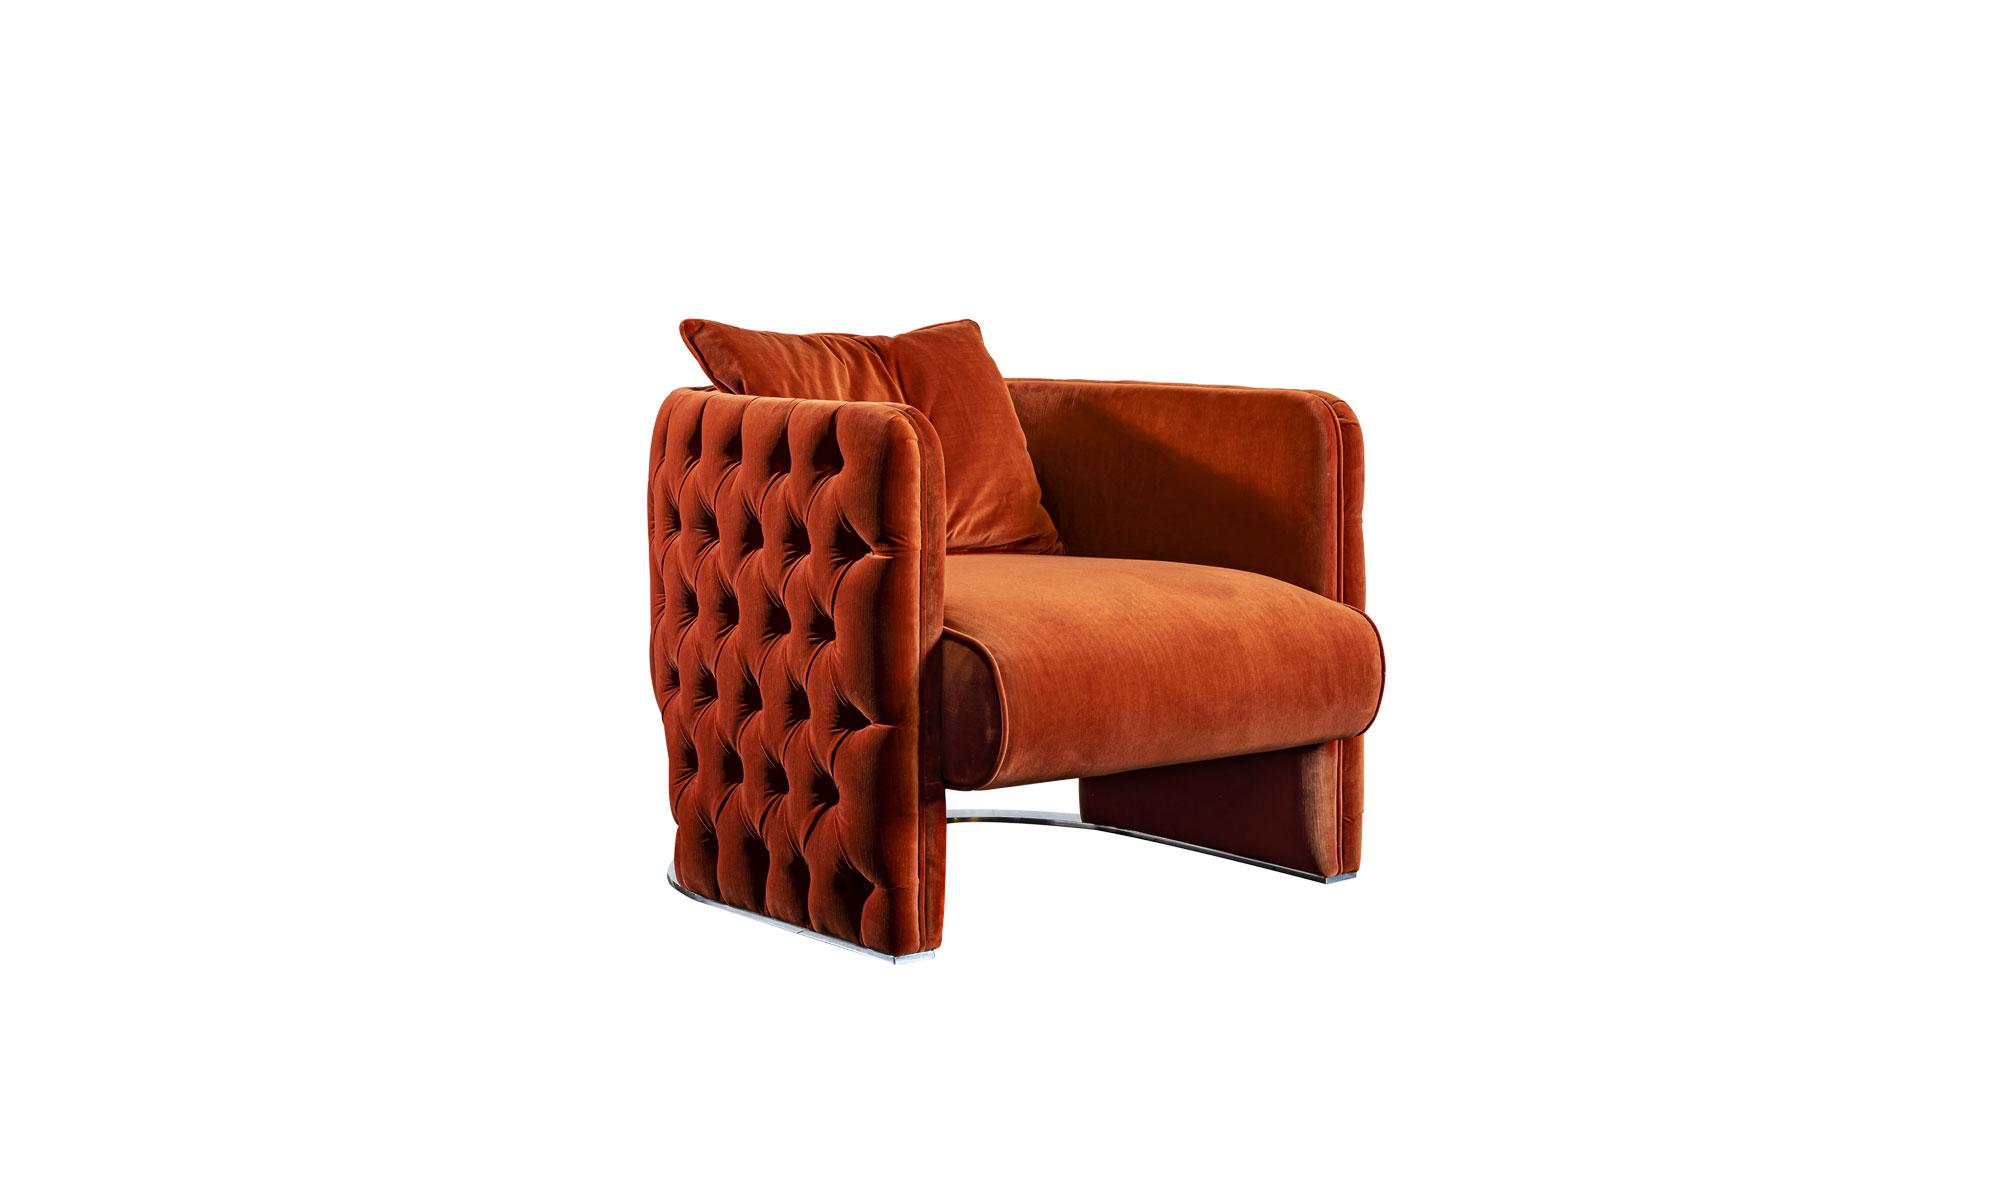 Royal Armchair - Elve Luxury